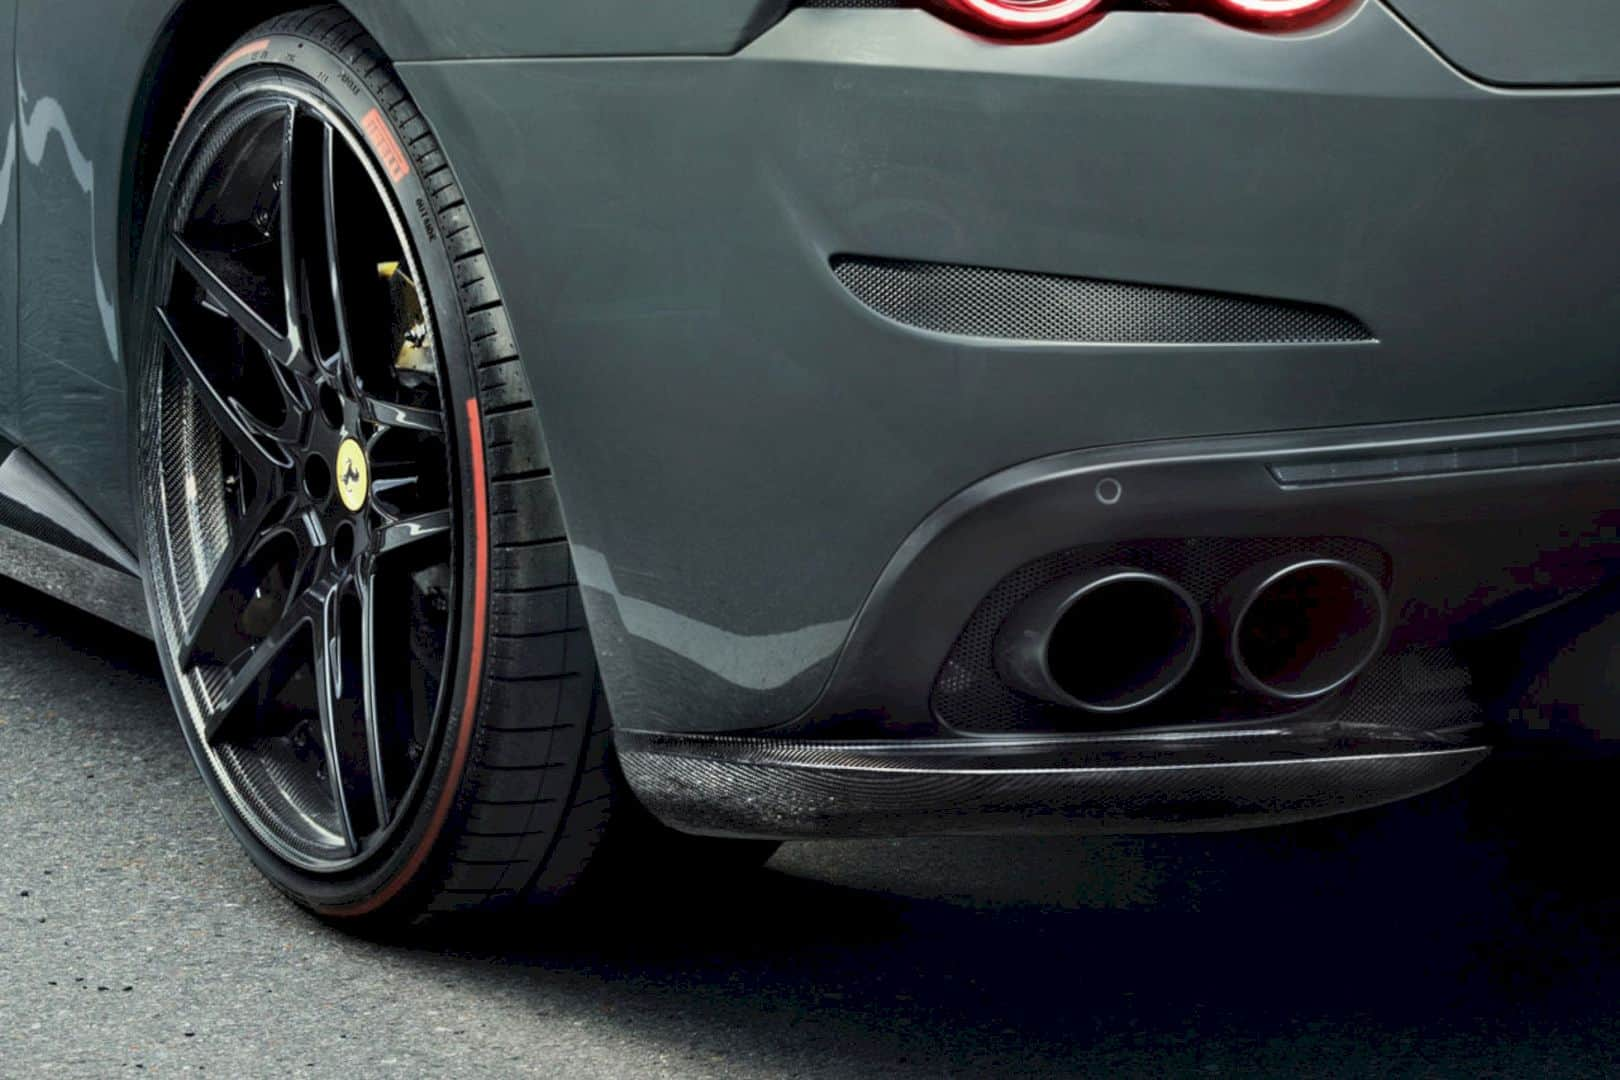 Ferrari Gtc4 Lusso By Novitec 2